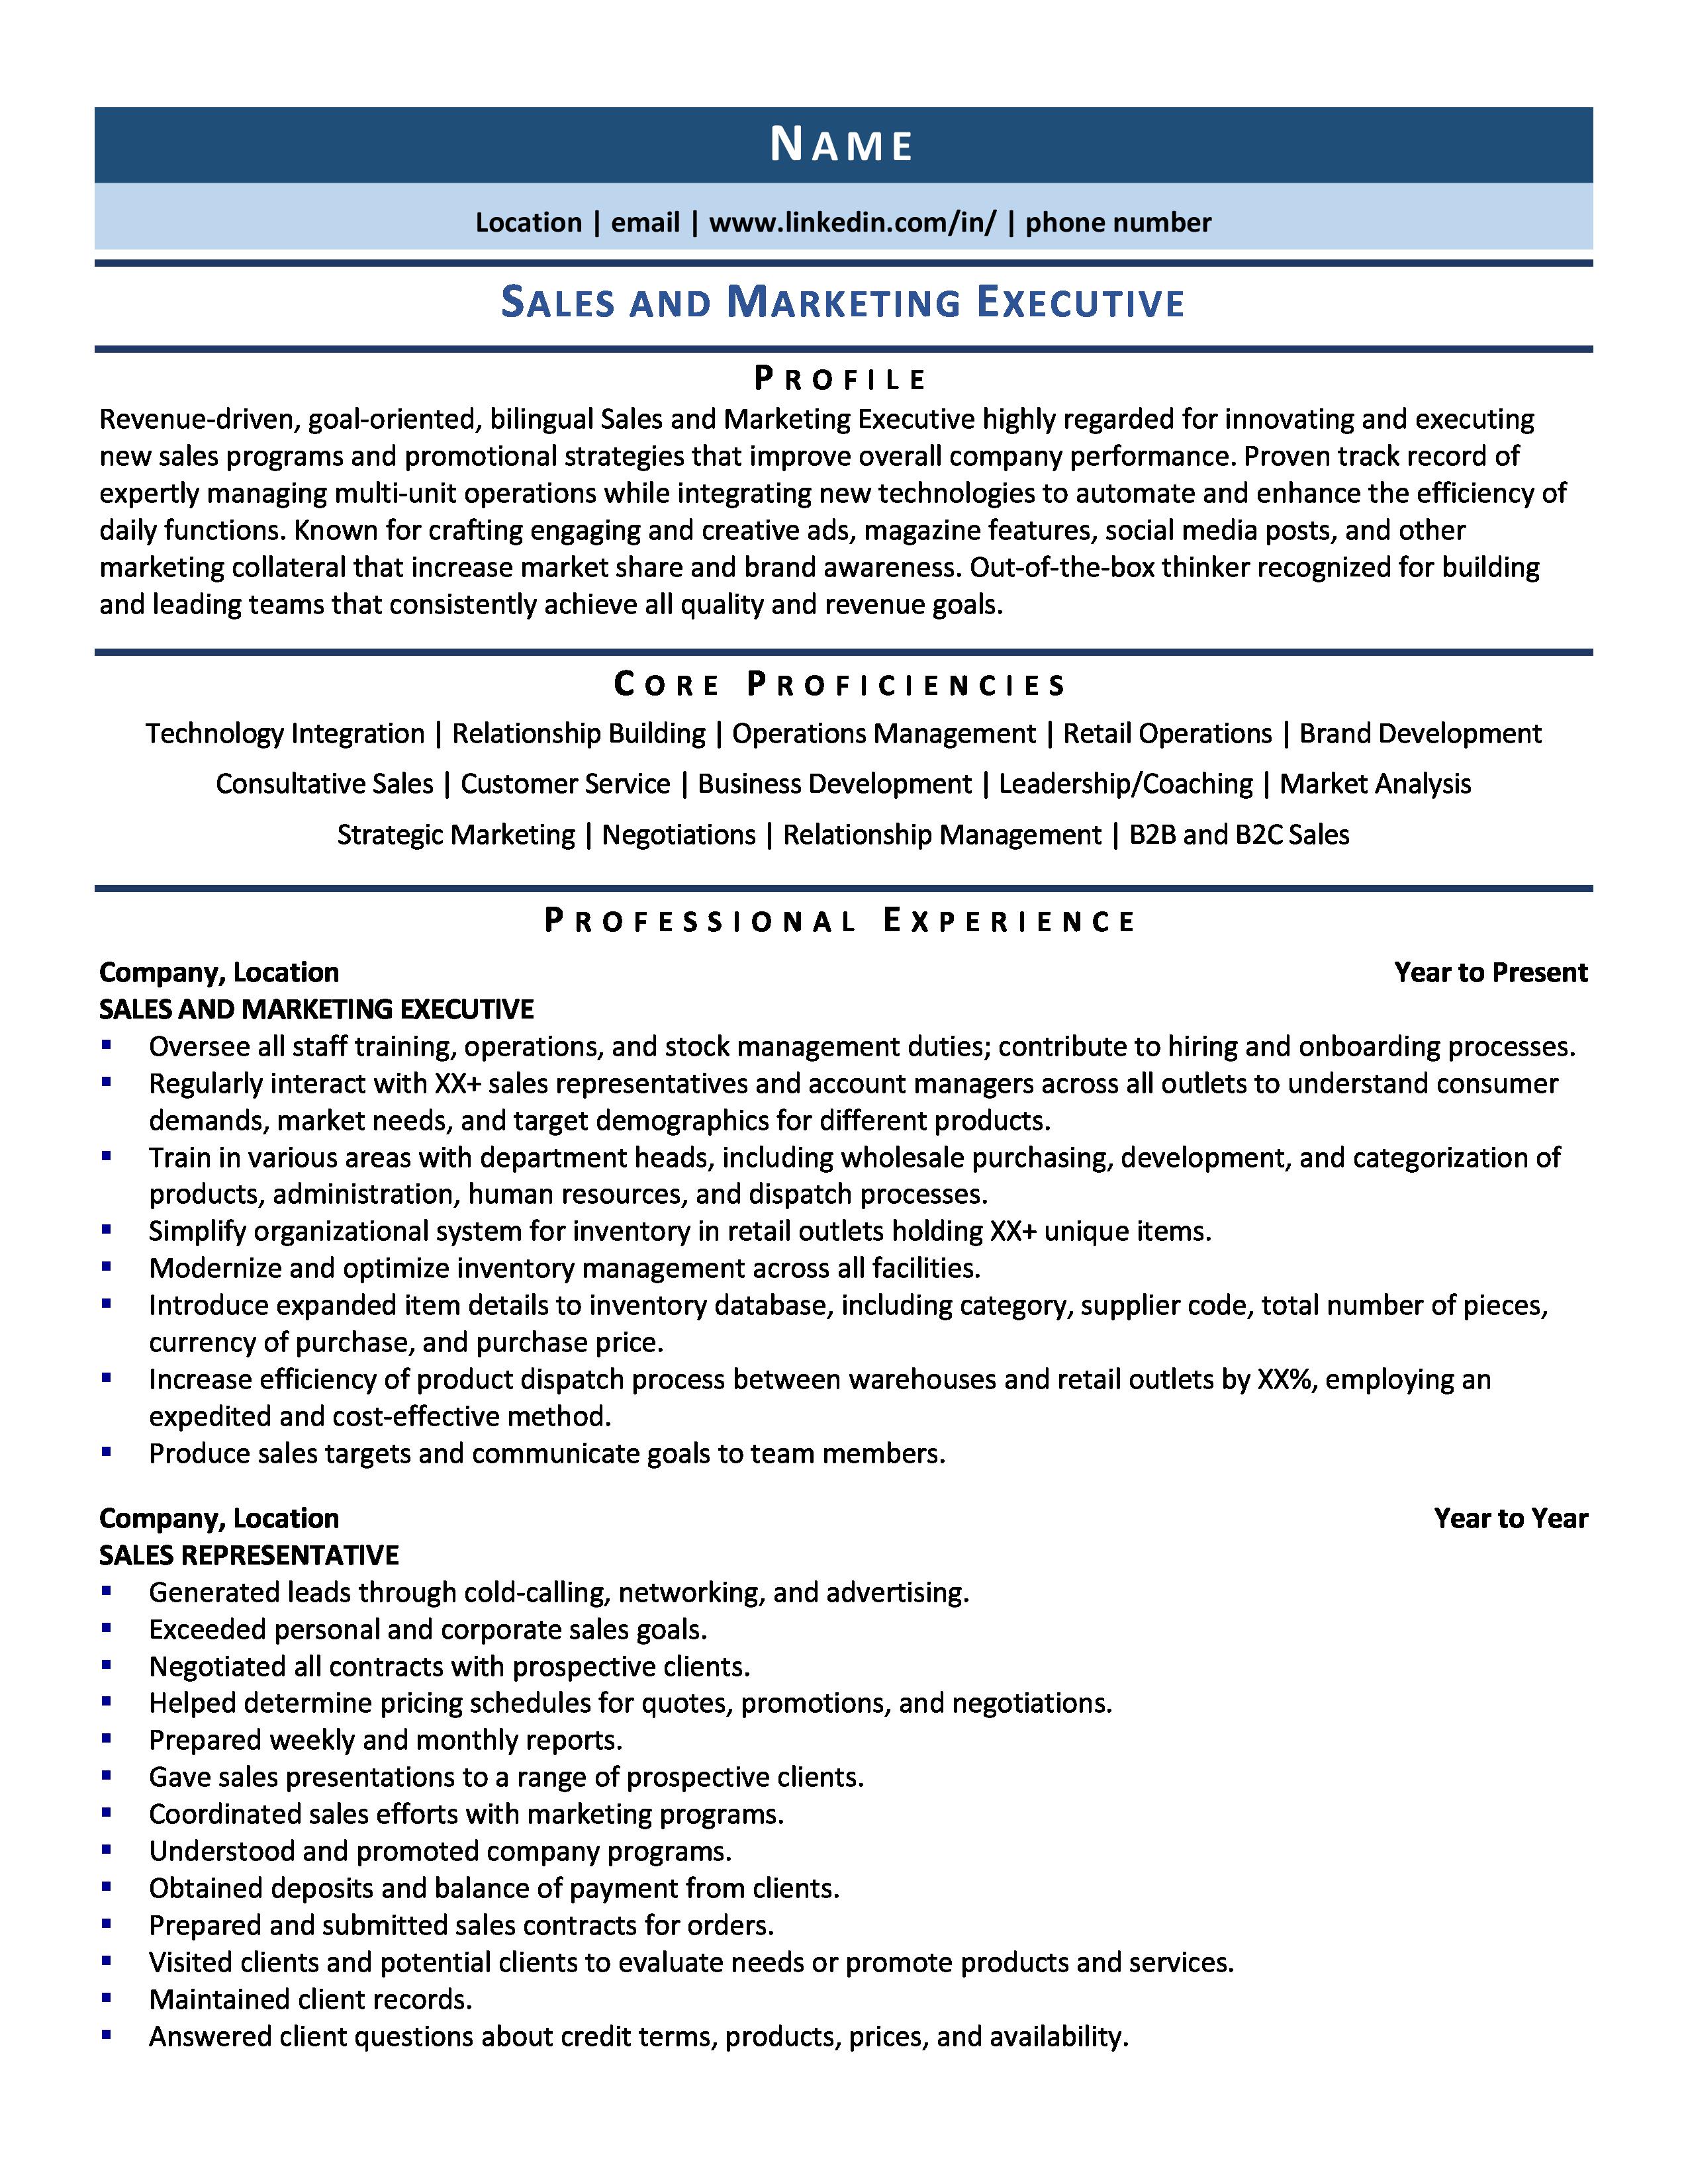 Salesresume Salesresumetemplate Salesresumeexample Professionalresume Salescv Resumeminimalist In 2021 Executive Resume Sales And Marketing Resume Examples